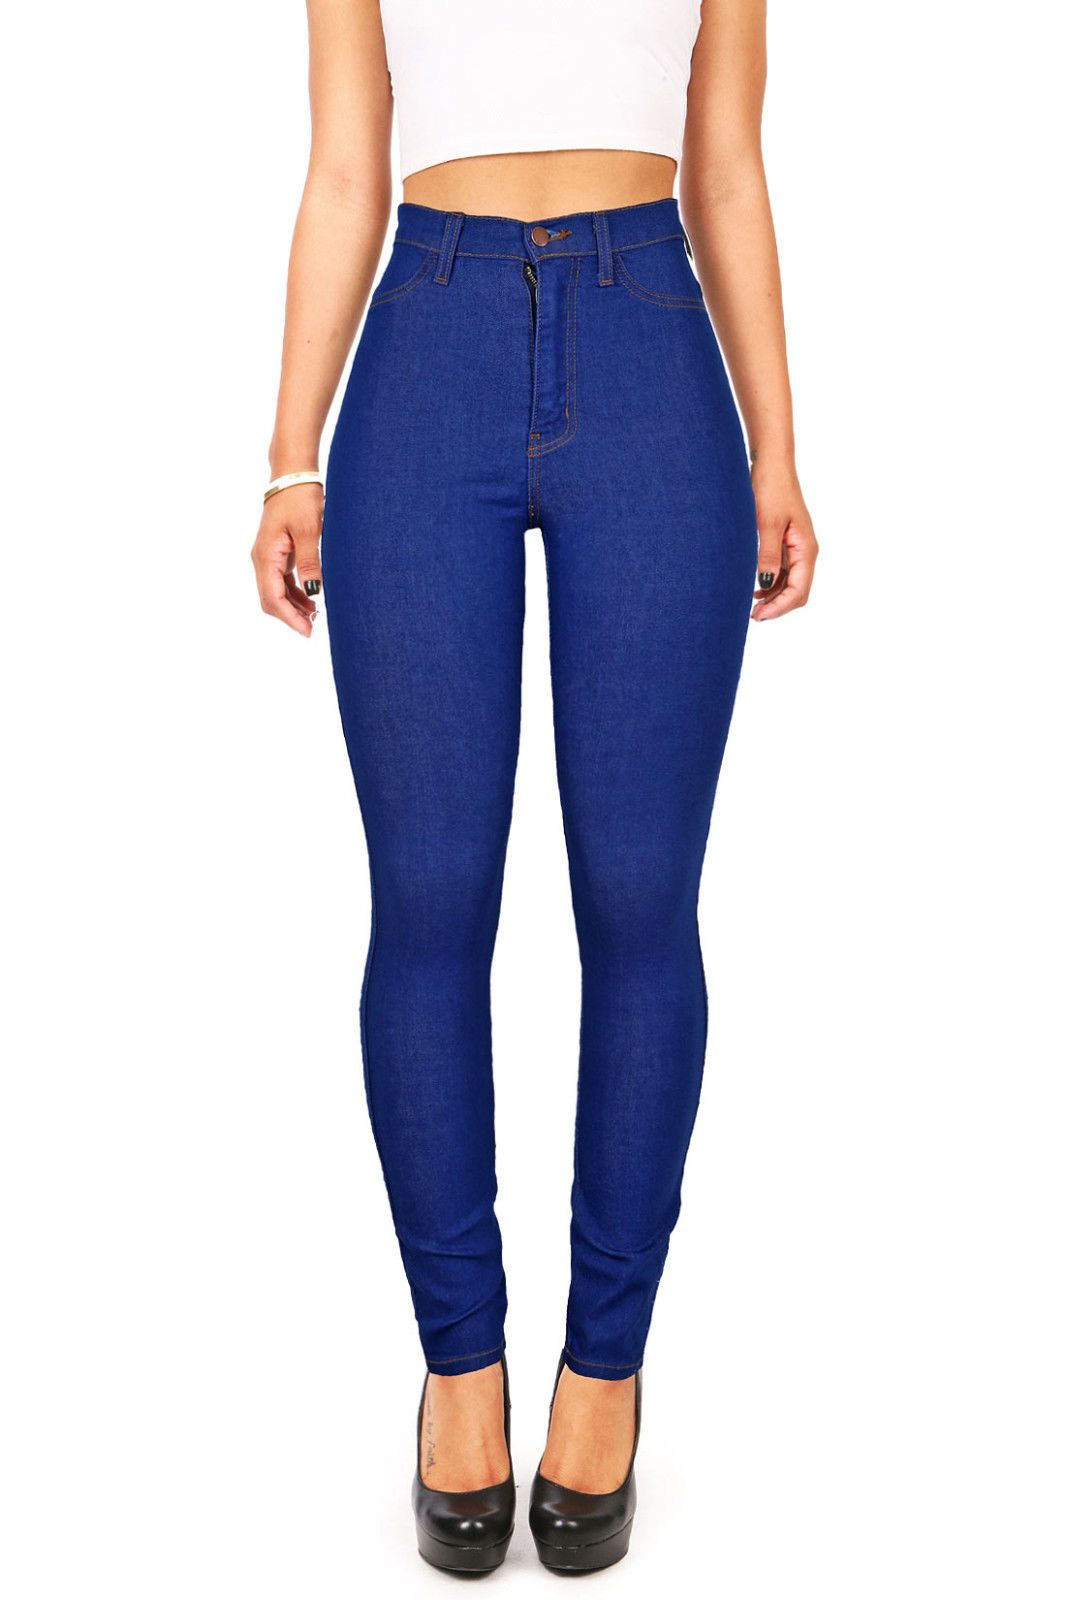 Vibrant Denim High Waist Lady Skinny Jeans High Waisted Skinnys Long Pants  USA d72e0b118